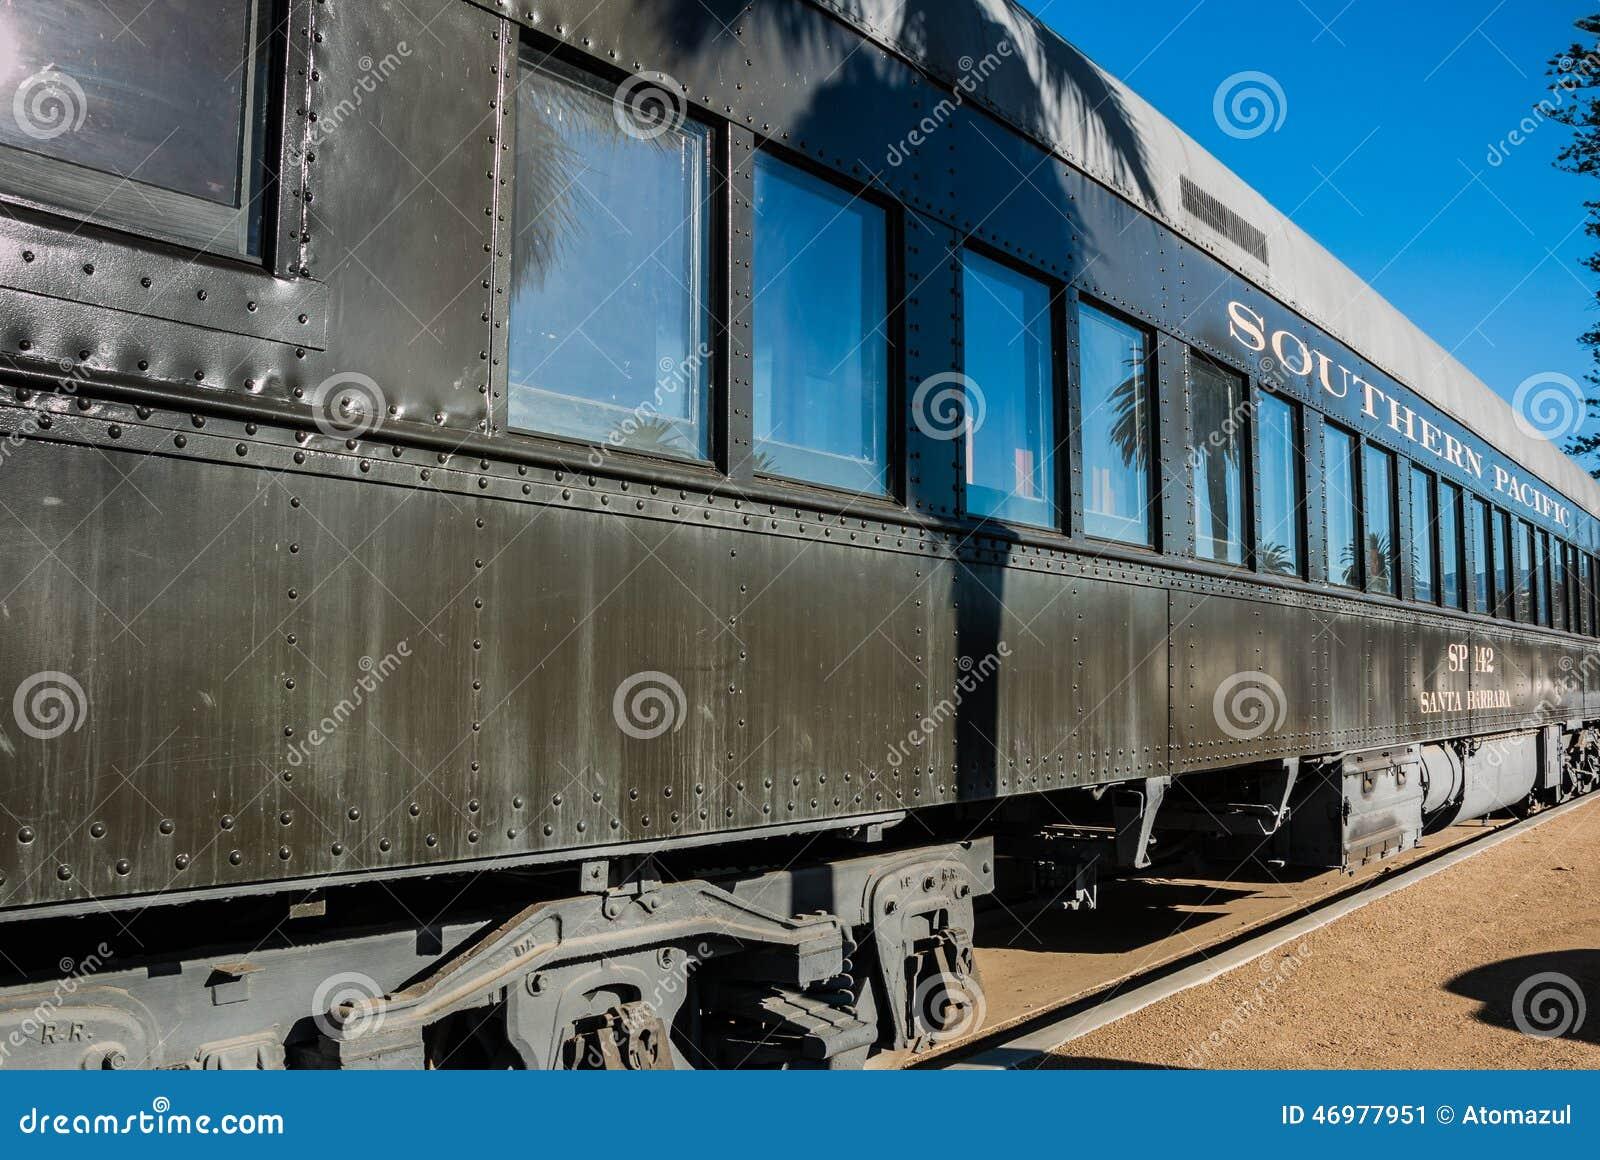 southern pacific train car santa barbara editorial photo image 46977951. Black Bedroom Furniture Sets. Home Design Ideas